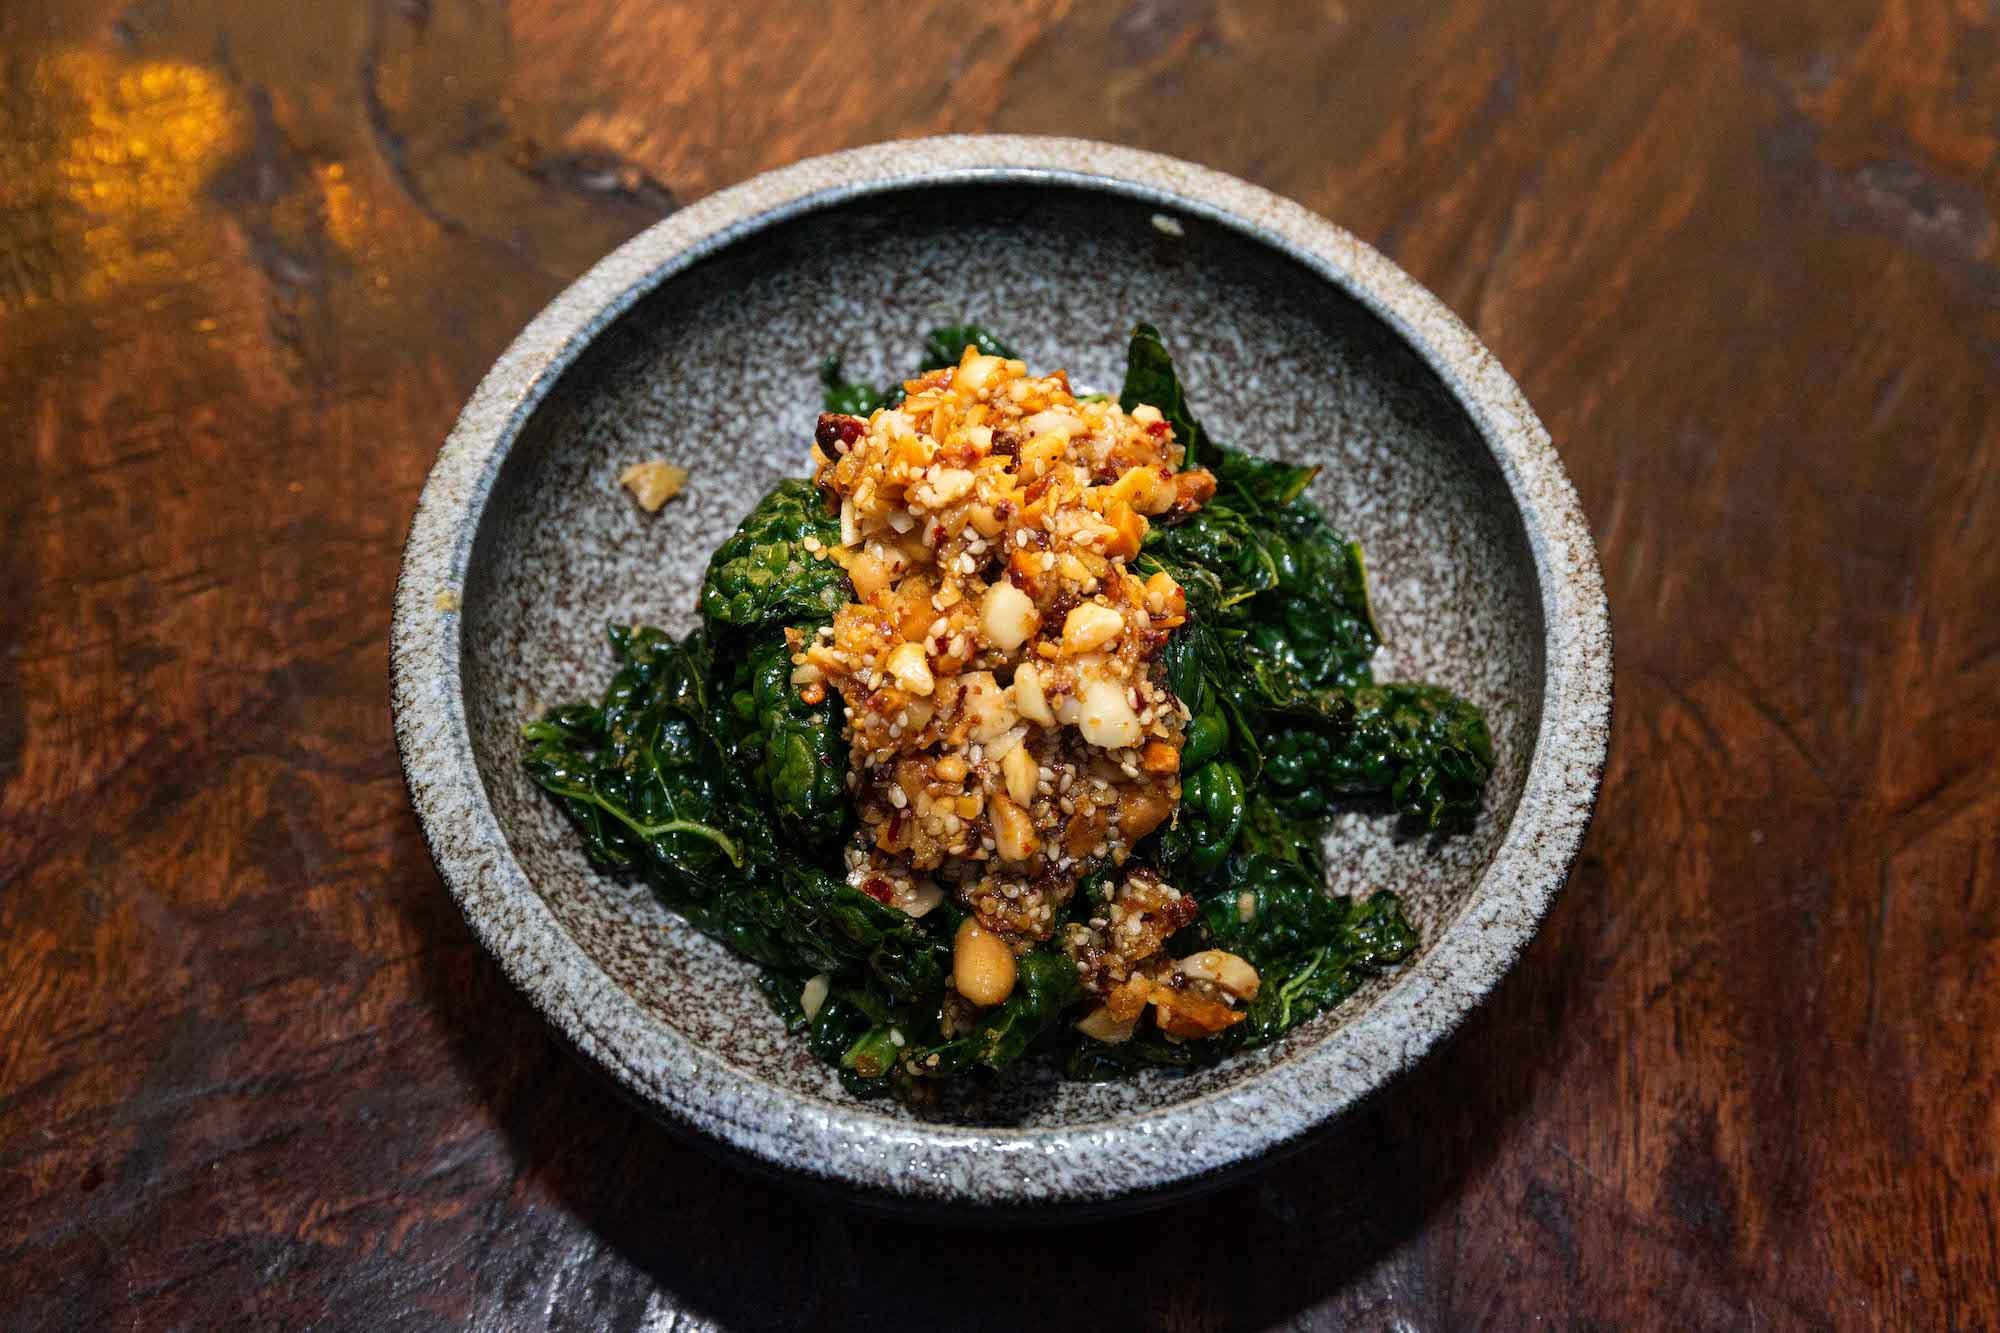 Black kale salad with sesame and peanut rayu